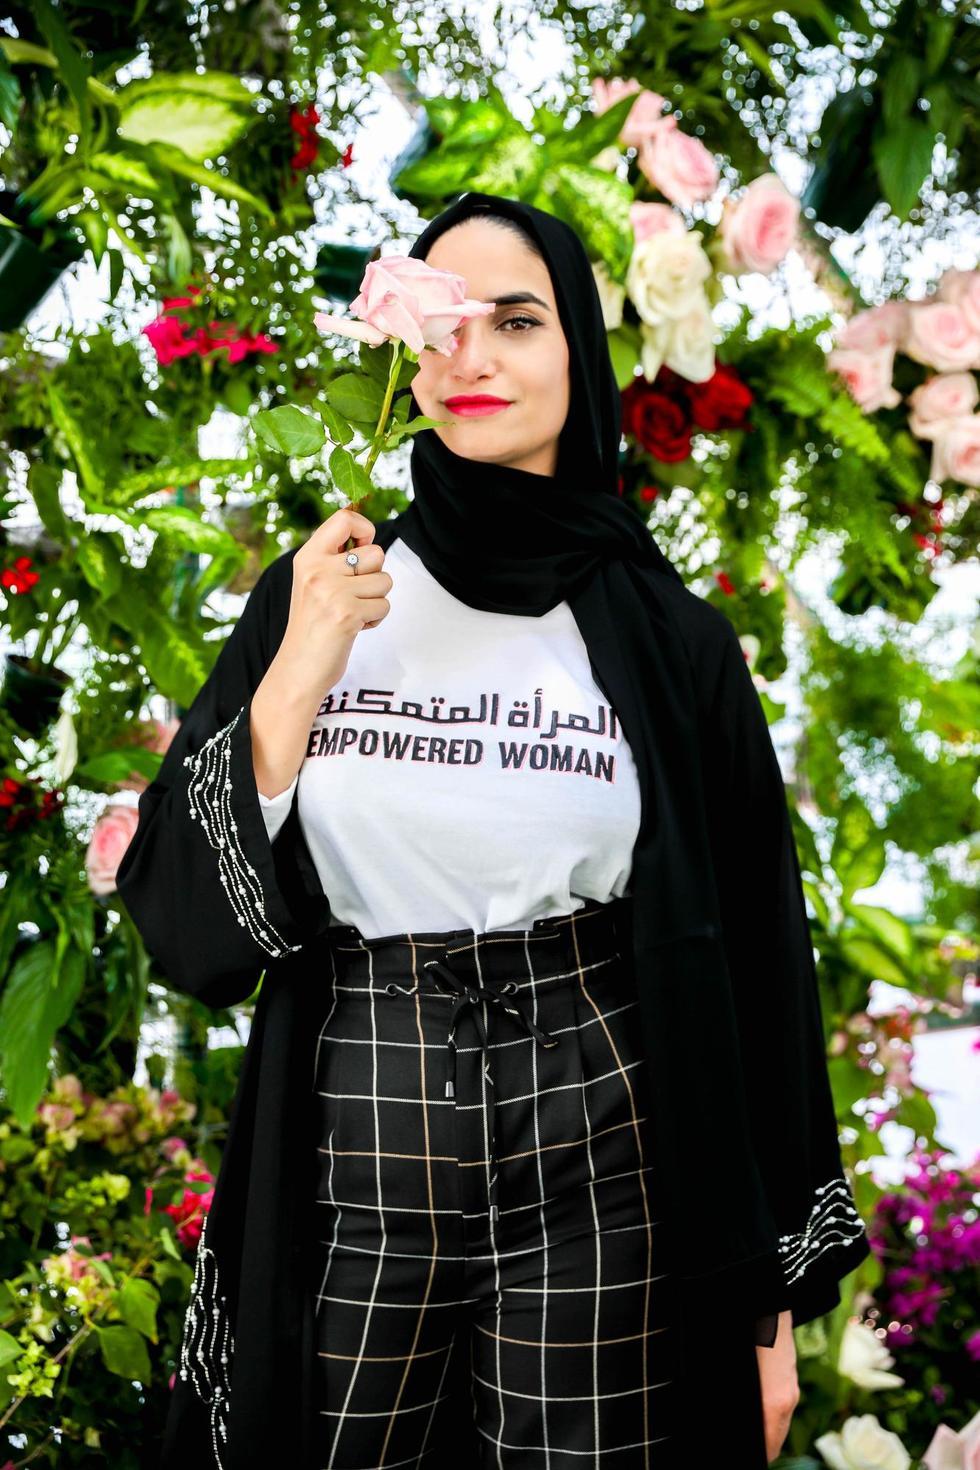 Platform 09 is back celebrating Arab women's success